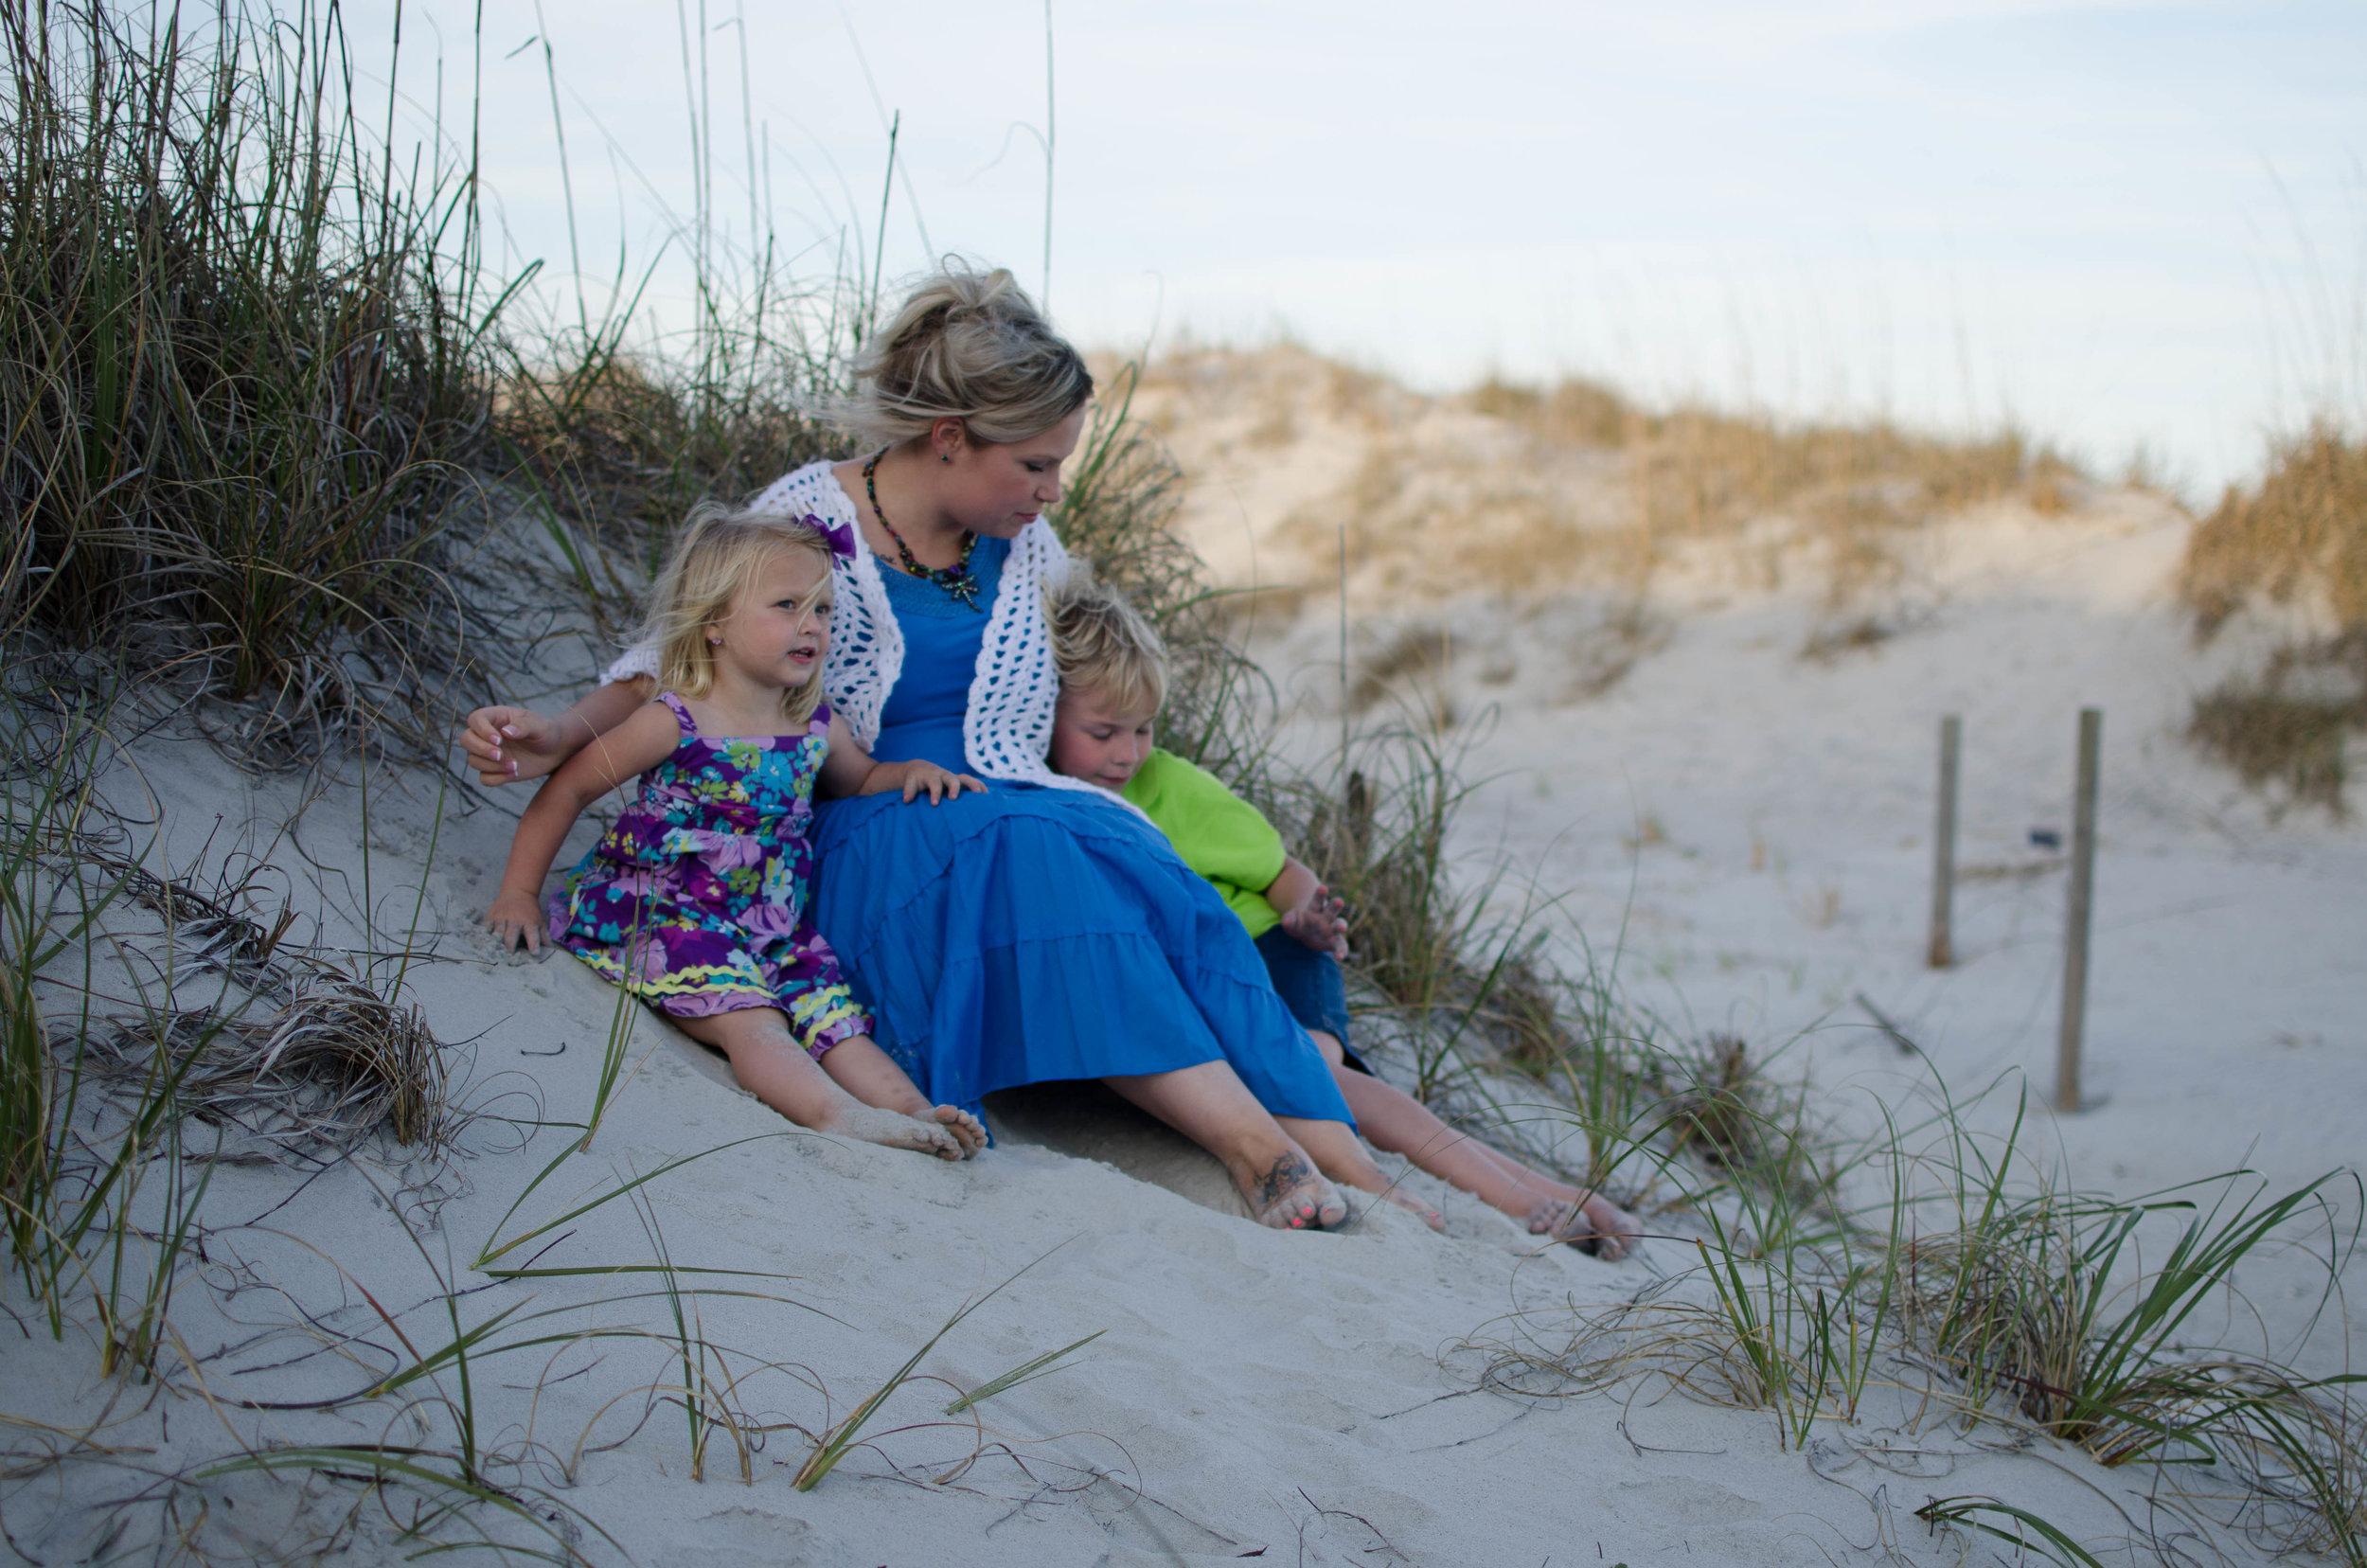 Assateague Island Photographer - Family Photographer - Pittsburgh Family Photographer - Beach Photography-2718-2.jpg